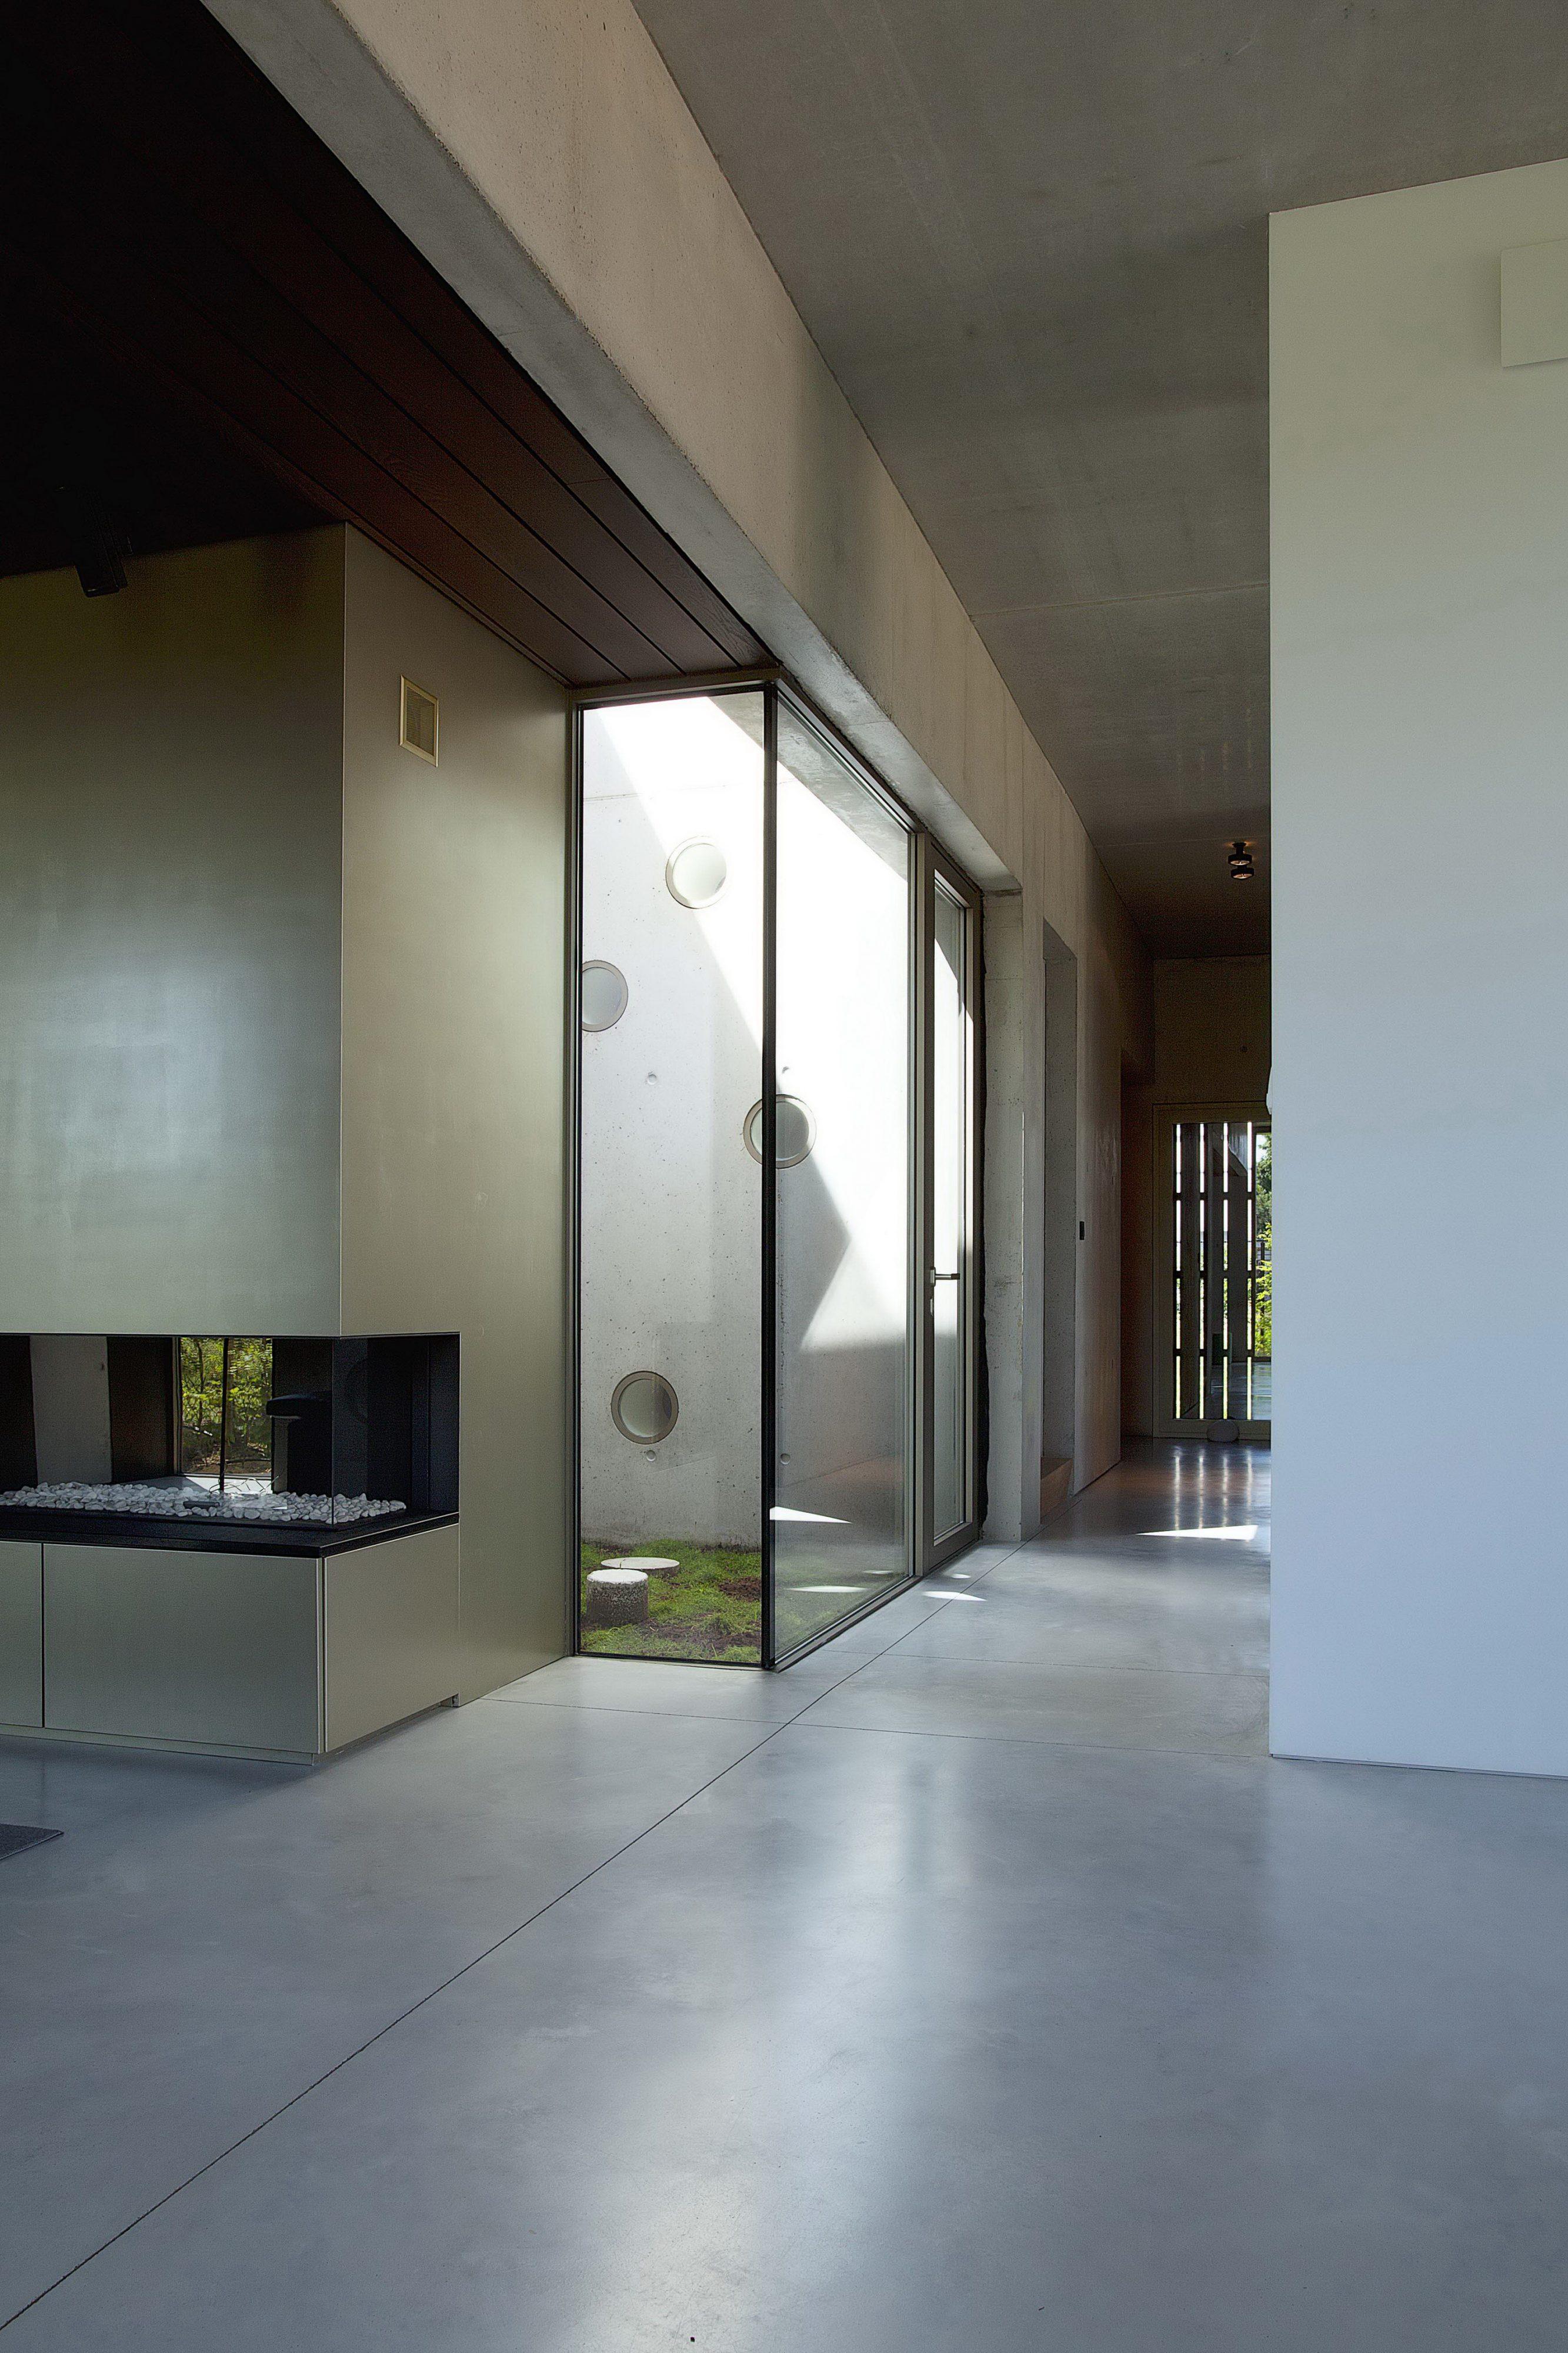 Concrete House Organized Around a Central Courtyard